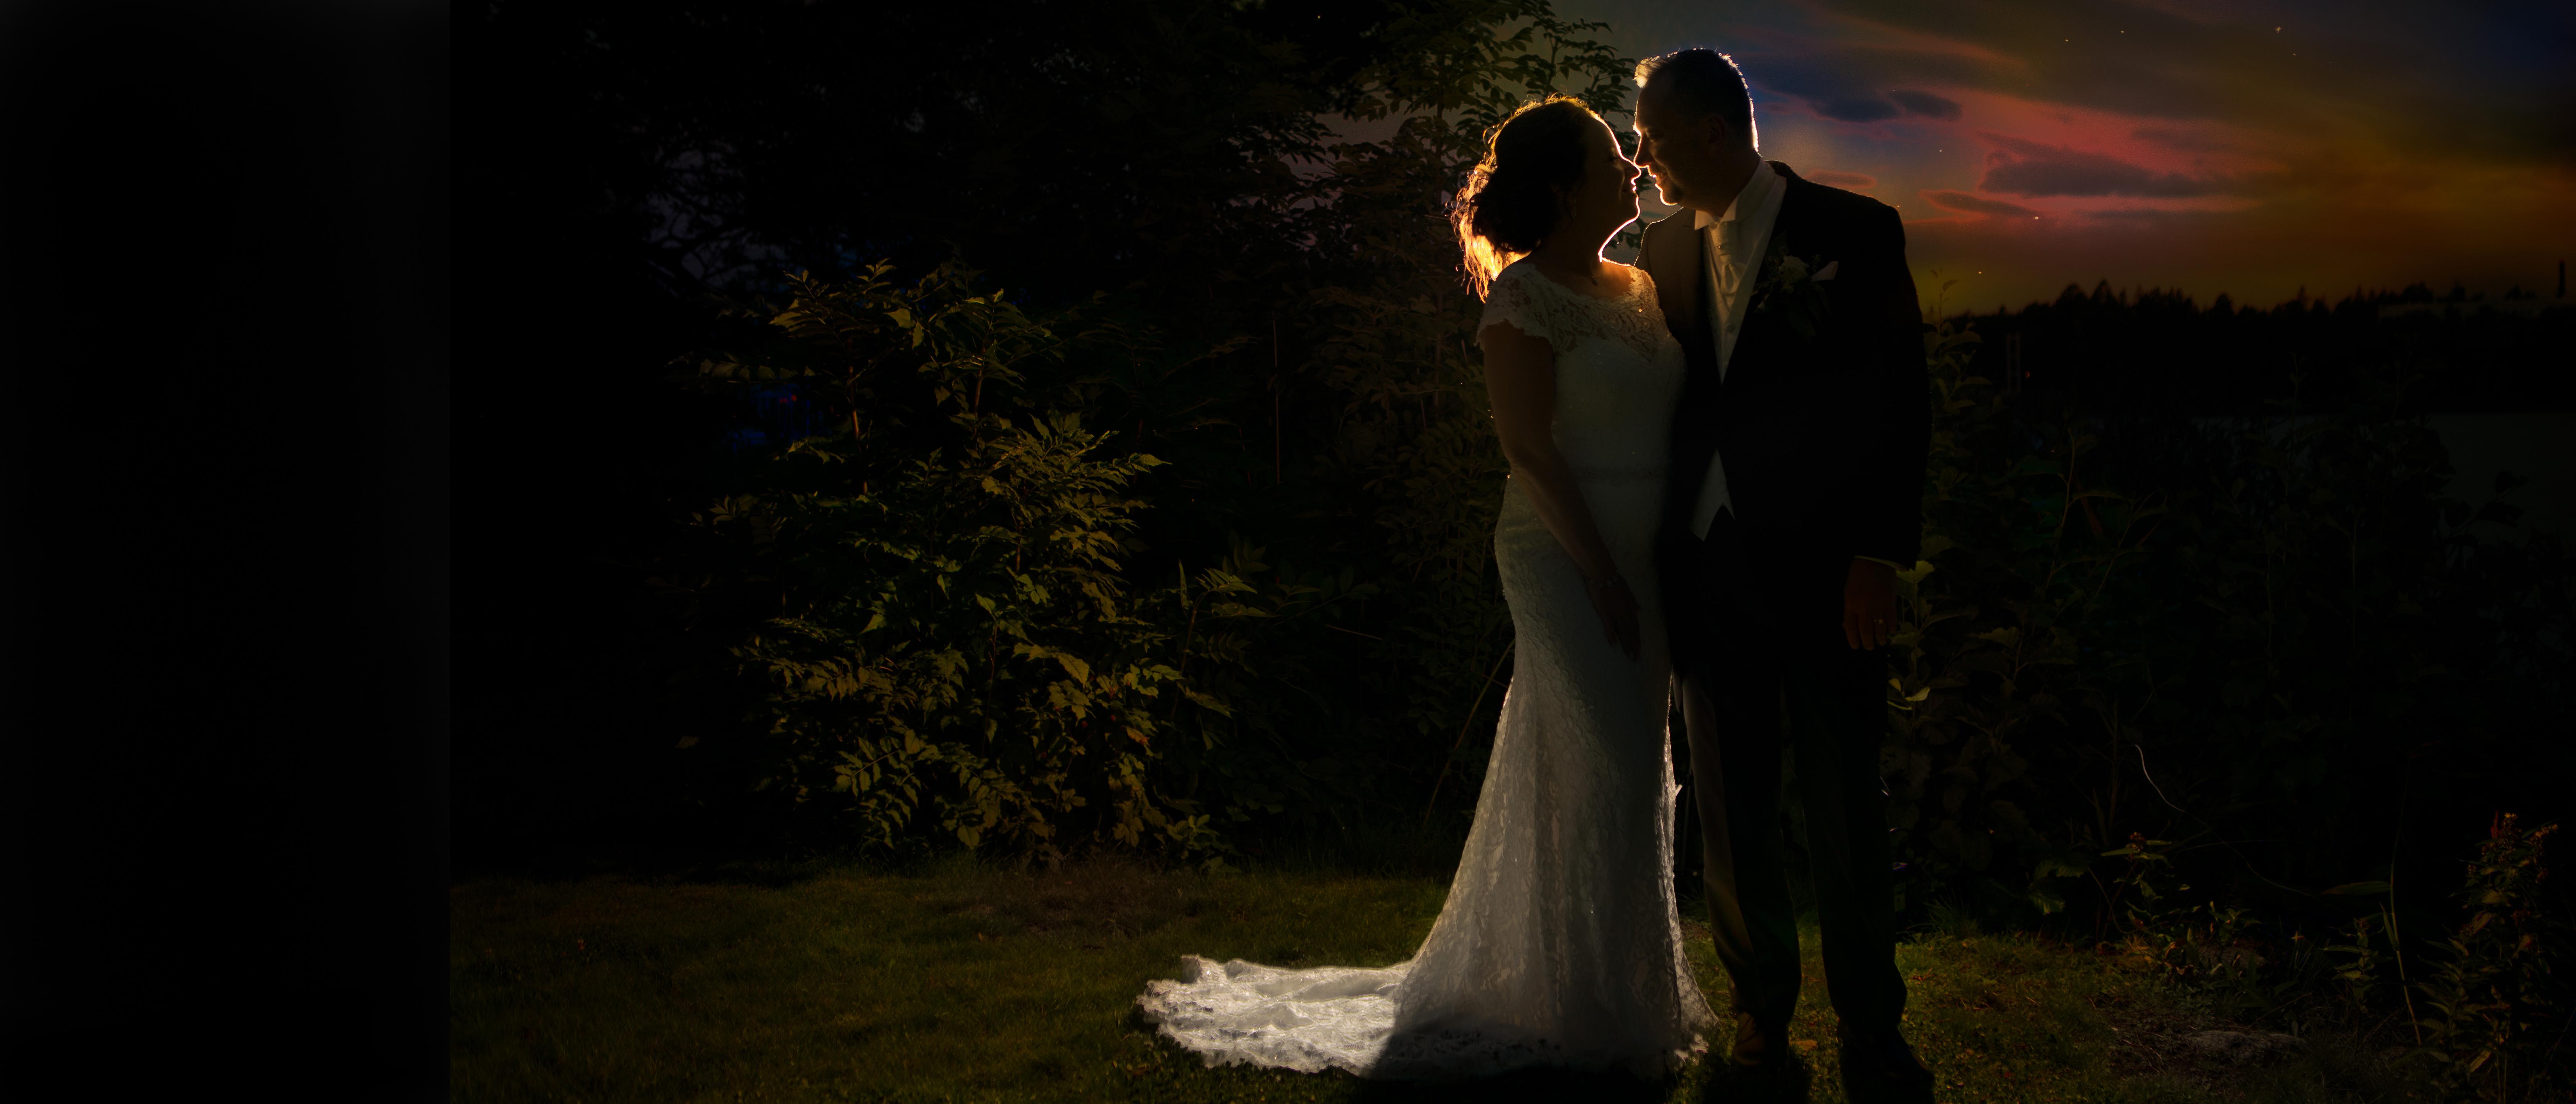 Bröllopsfotografering Jessica & Richard 2018